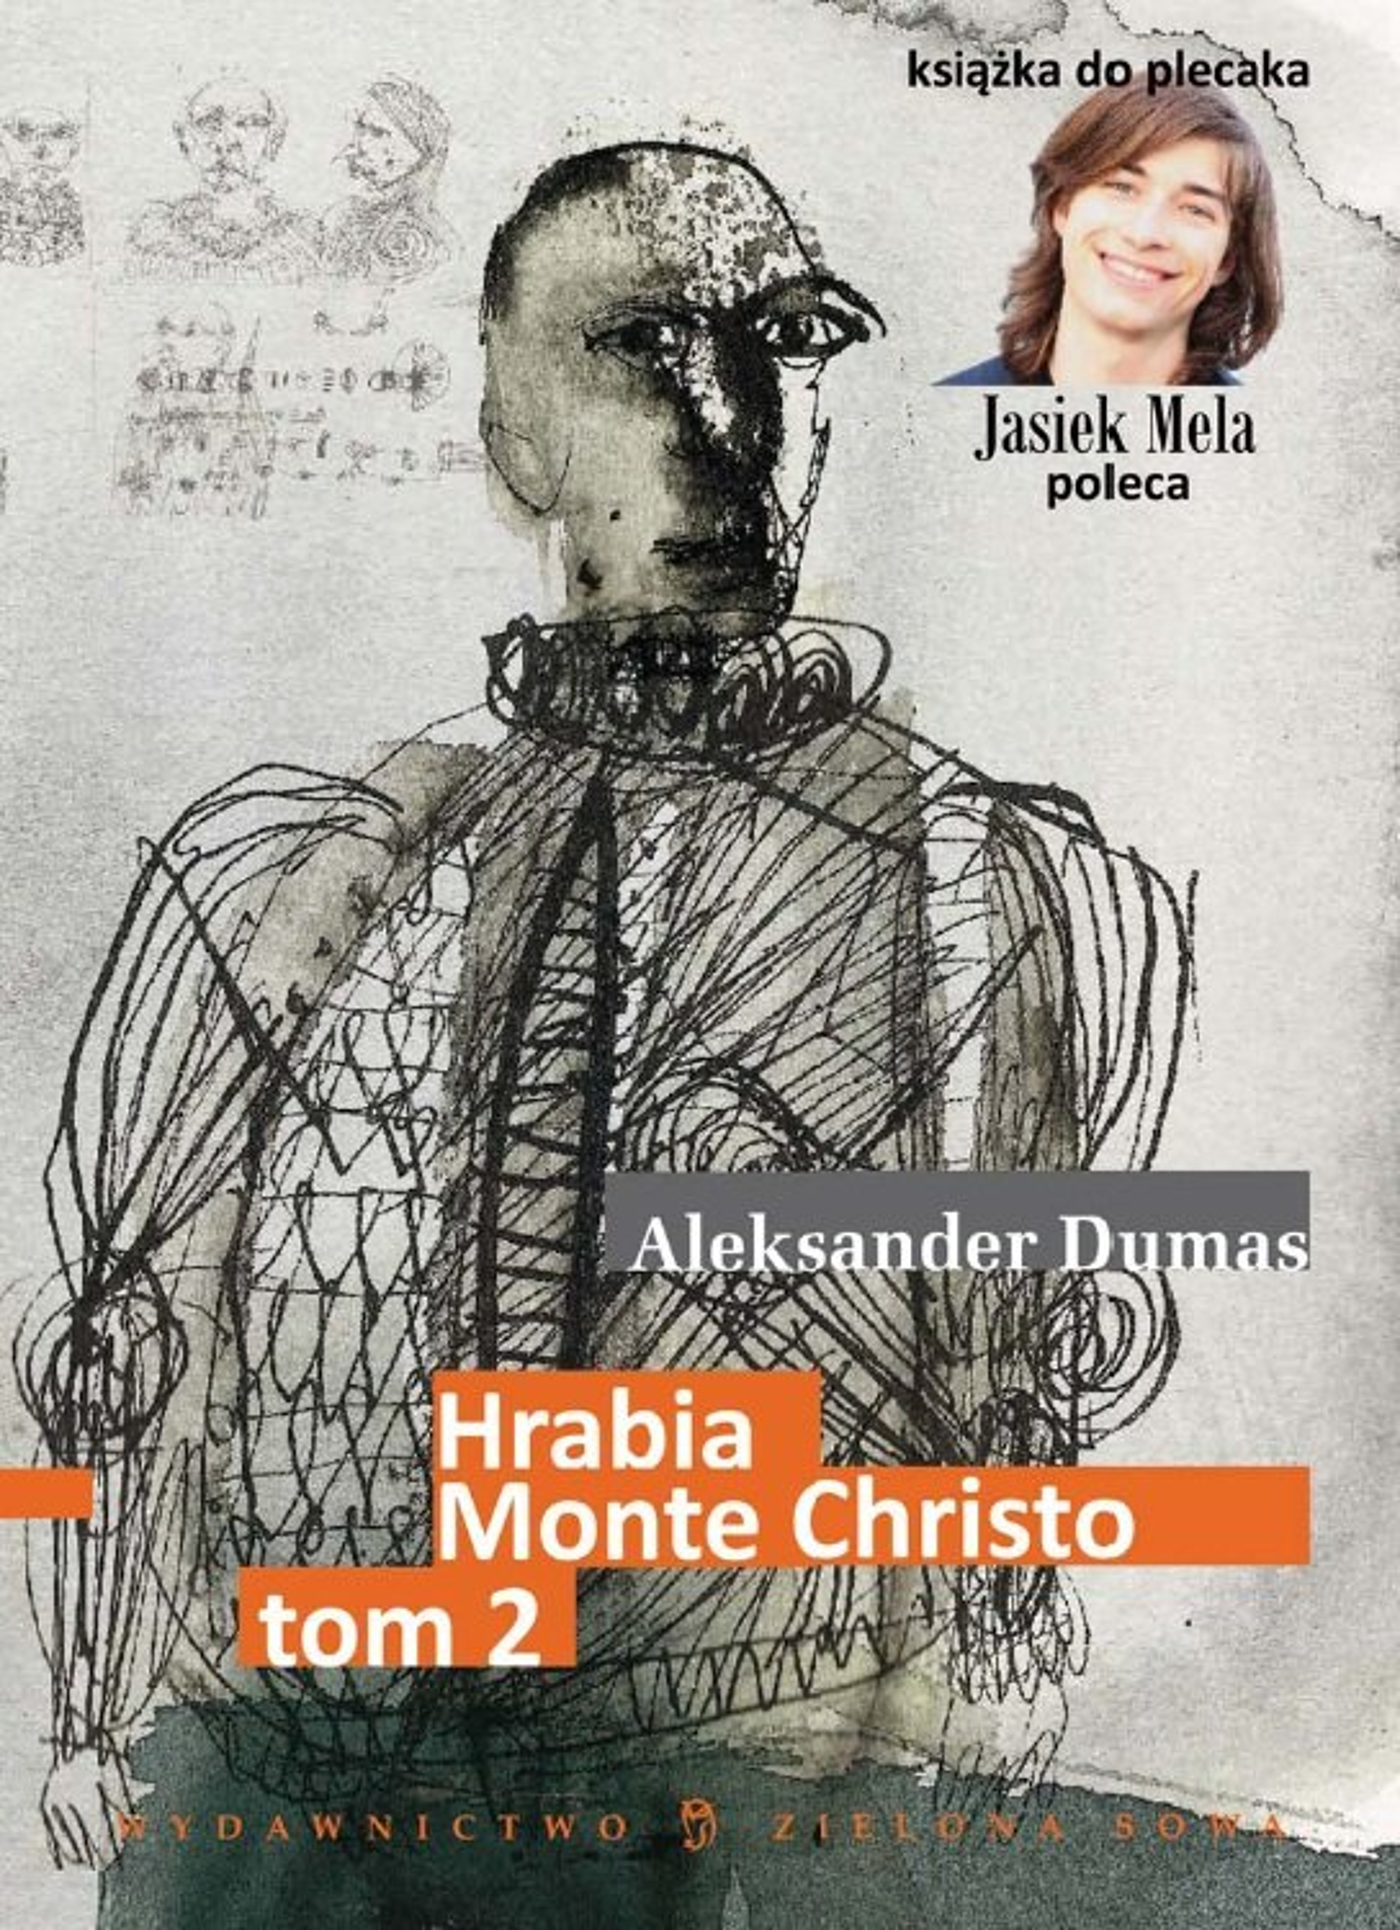 Hrabia Monte Christo. Tom II - Ebook (Książka EPUB) do pobrania w formacie EPUB